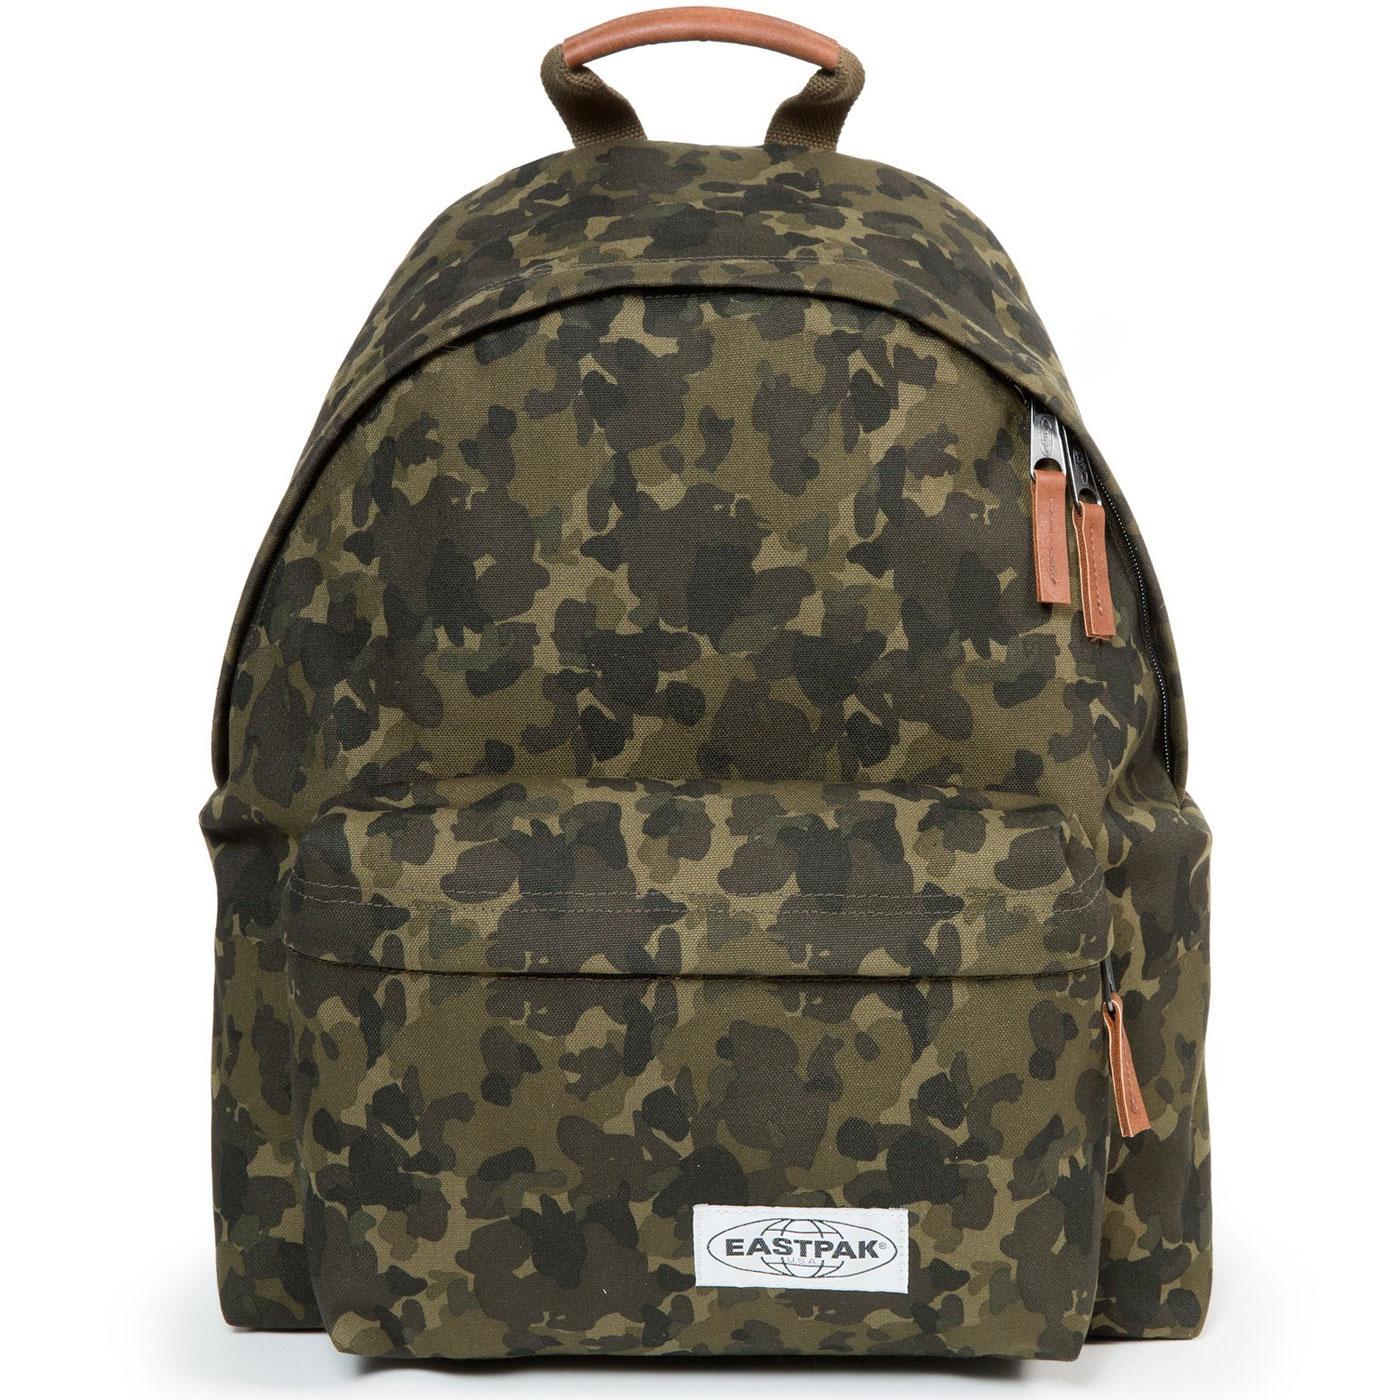 Padded Pak'r EASTPAK Laptop Backpack OPGRADE CAMO